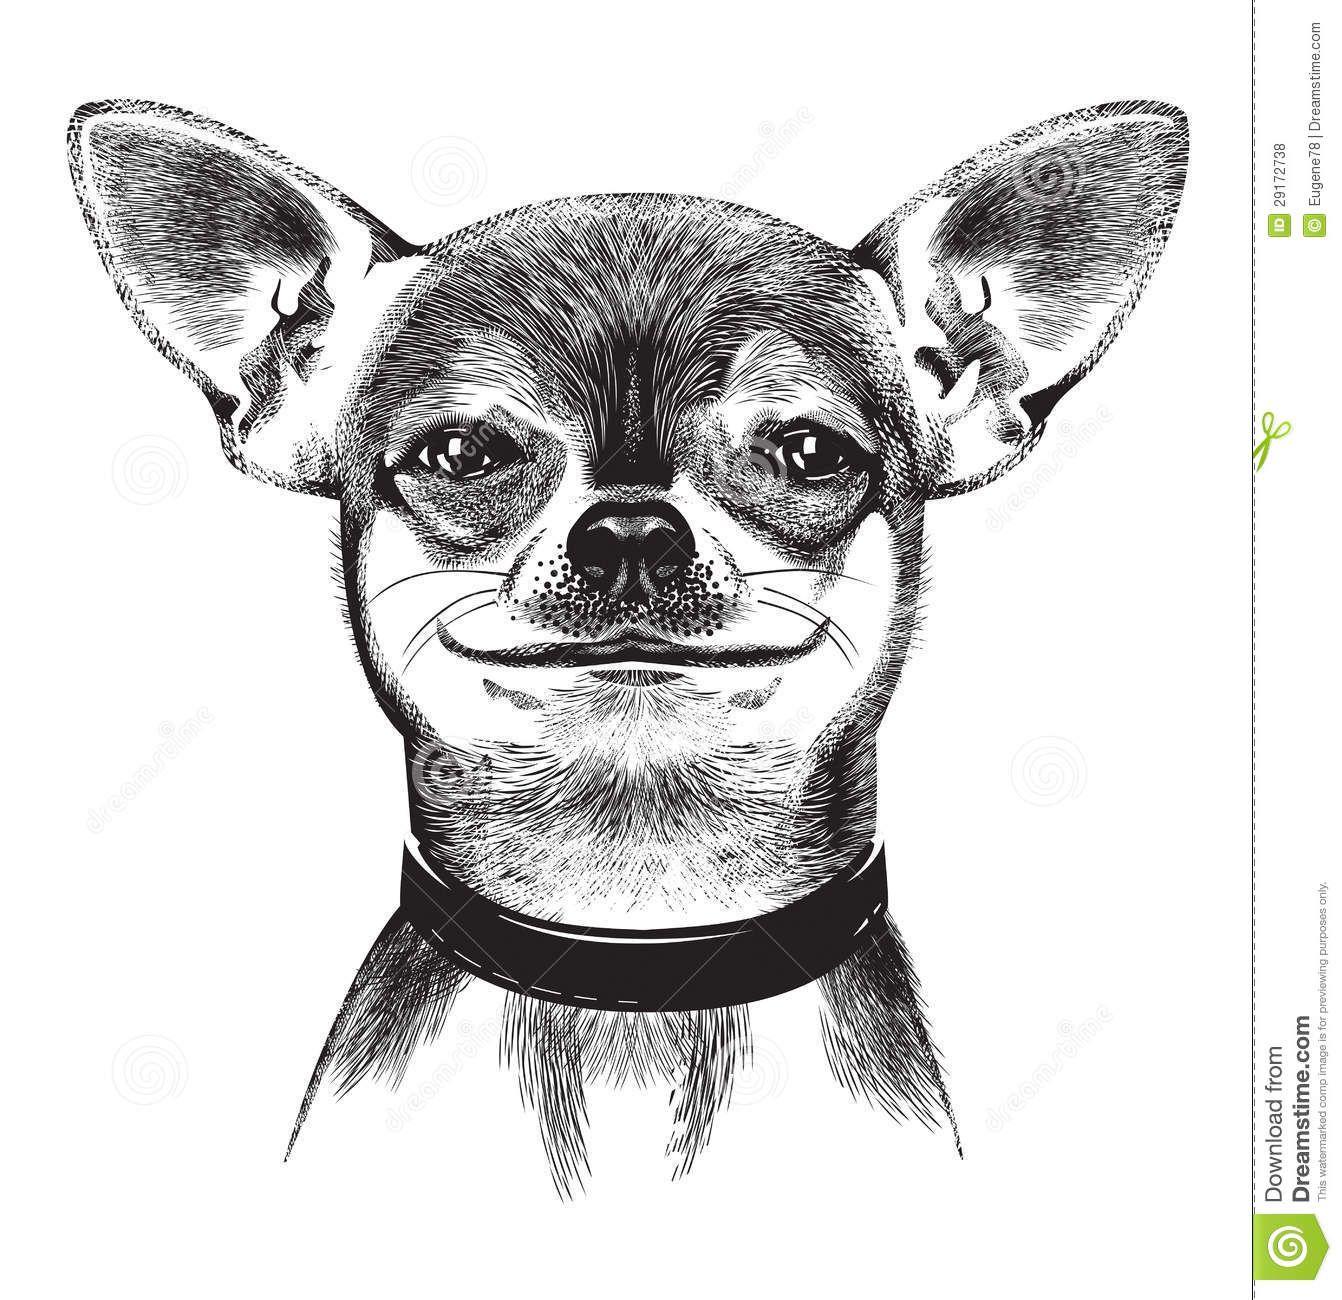 Angry chihuahua clipart vector black and white Cartoon Chihuahua Dog Clip Art Royalty Free Stock Image - Image ... vector black and white